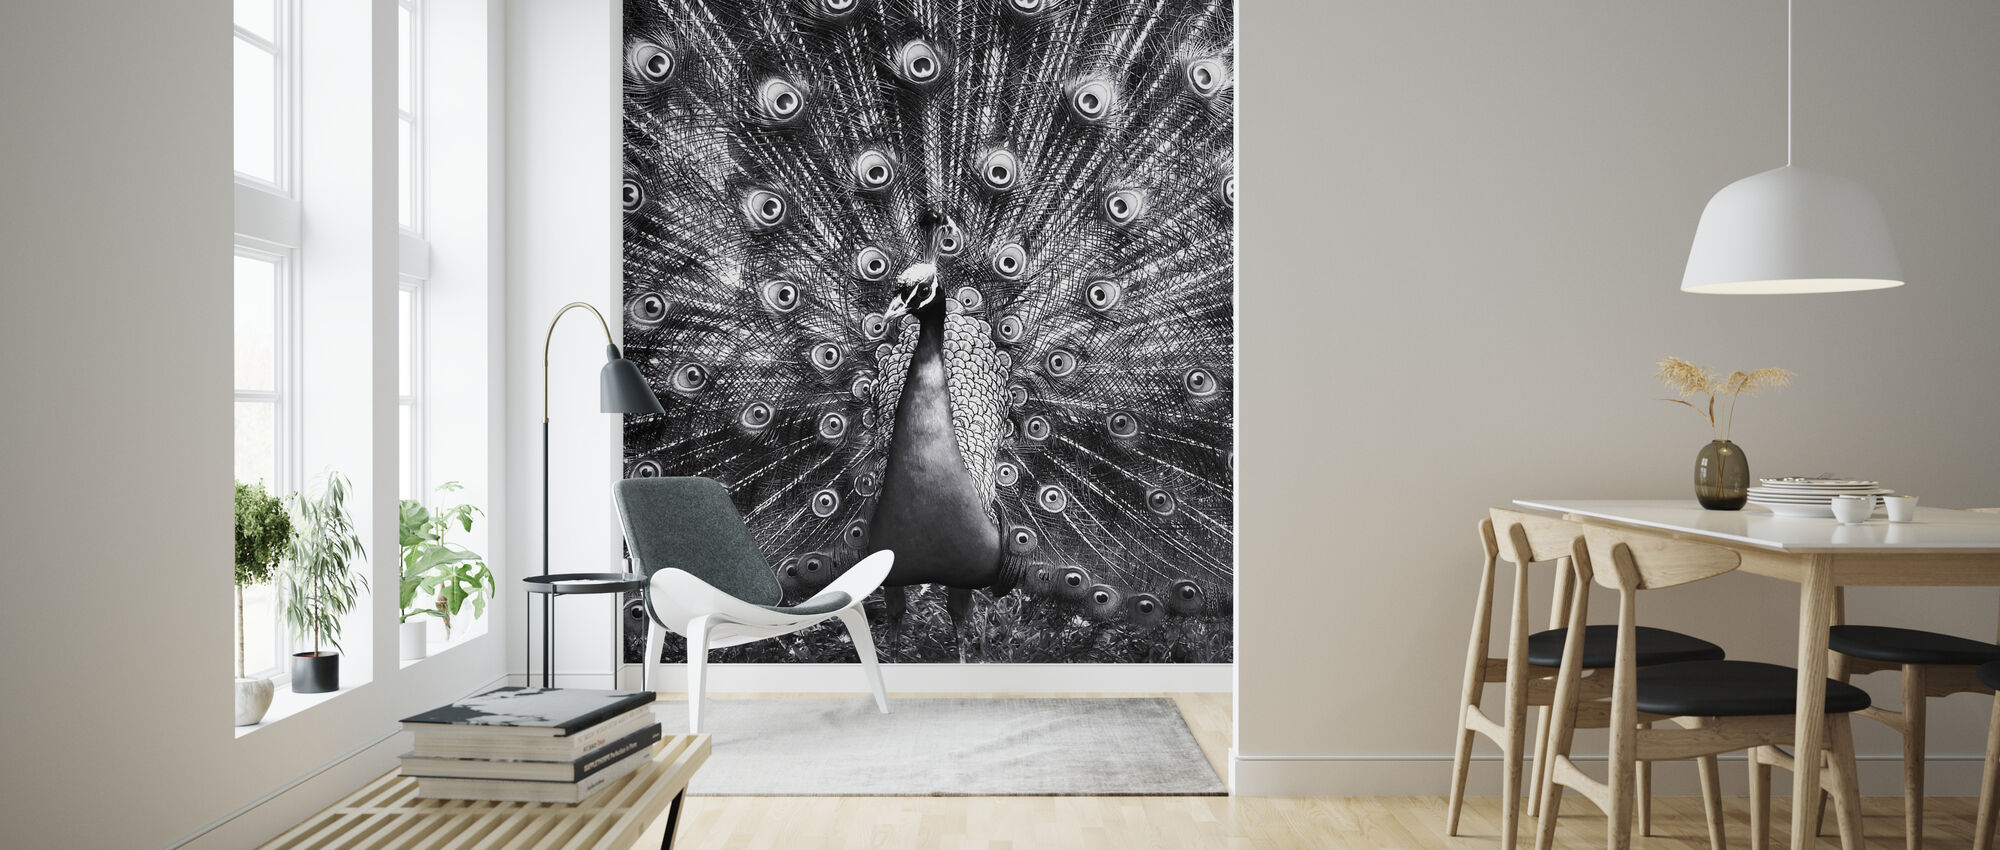 Peacock - Wallpaper - Living Room